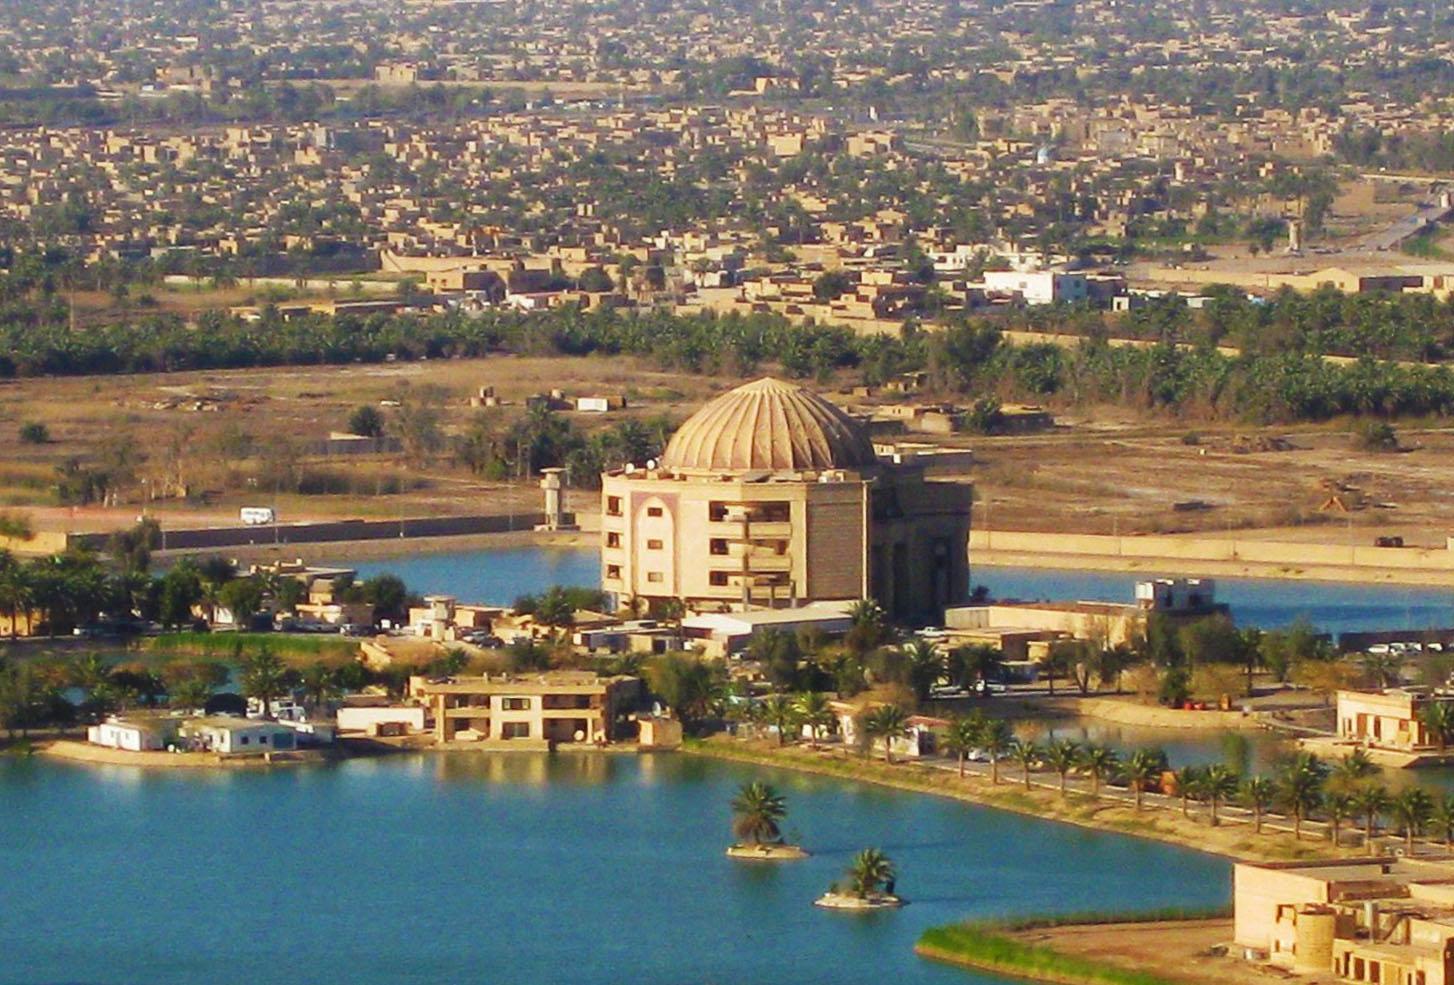 Baghdad__Iraq_by_saurius